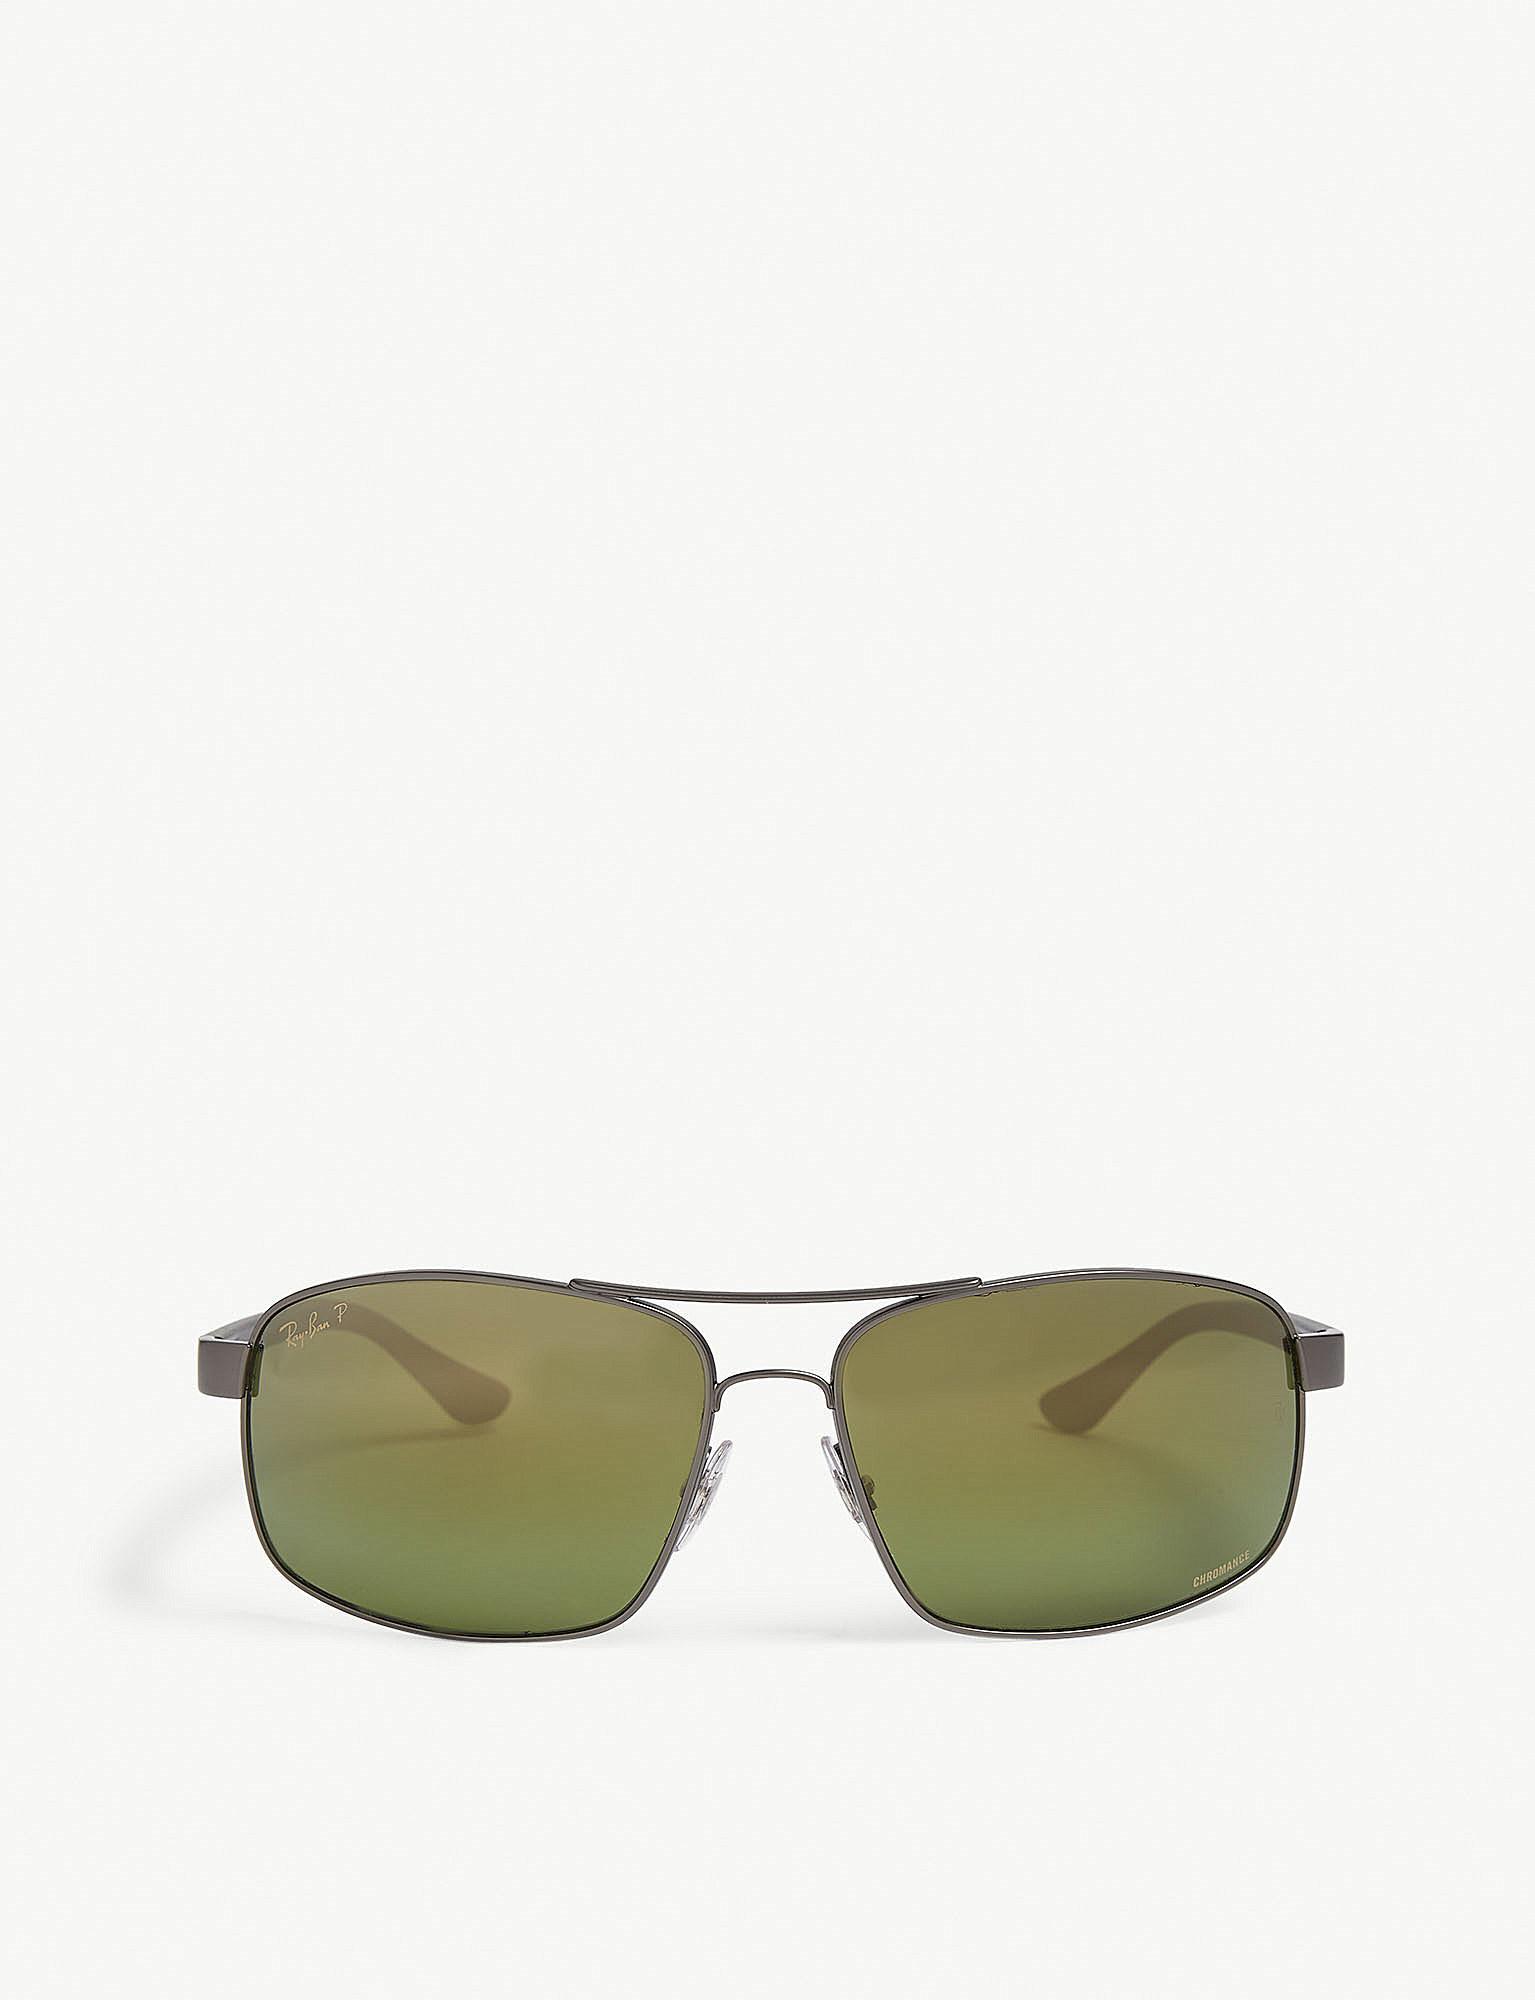 d5387f21f04a8b Rb3429m 58 Gold Square Sunglasses new arrive d4ca3 5c03b  Ray-Ban. Mens  Green Rb3604 Chromance Rectangle-frame Sunglasses timeless design 78f61  1bc2e ...